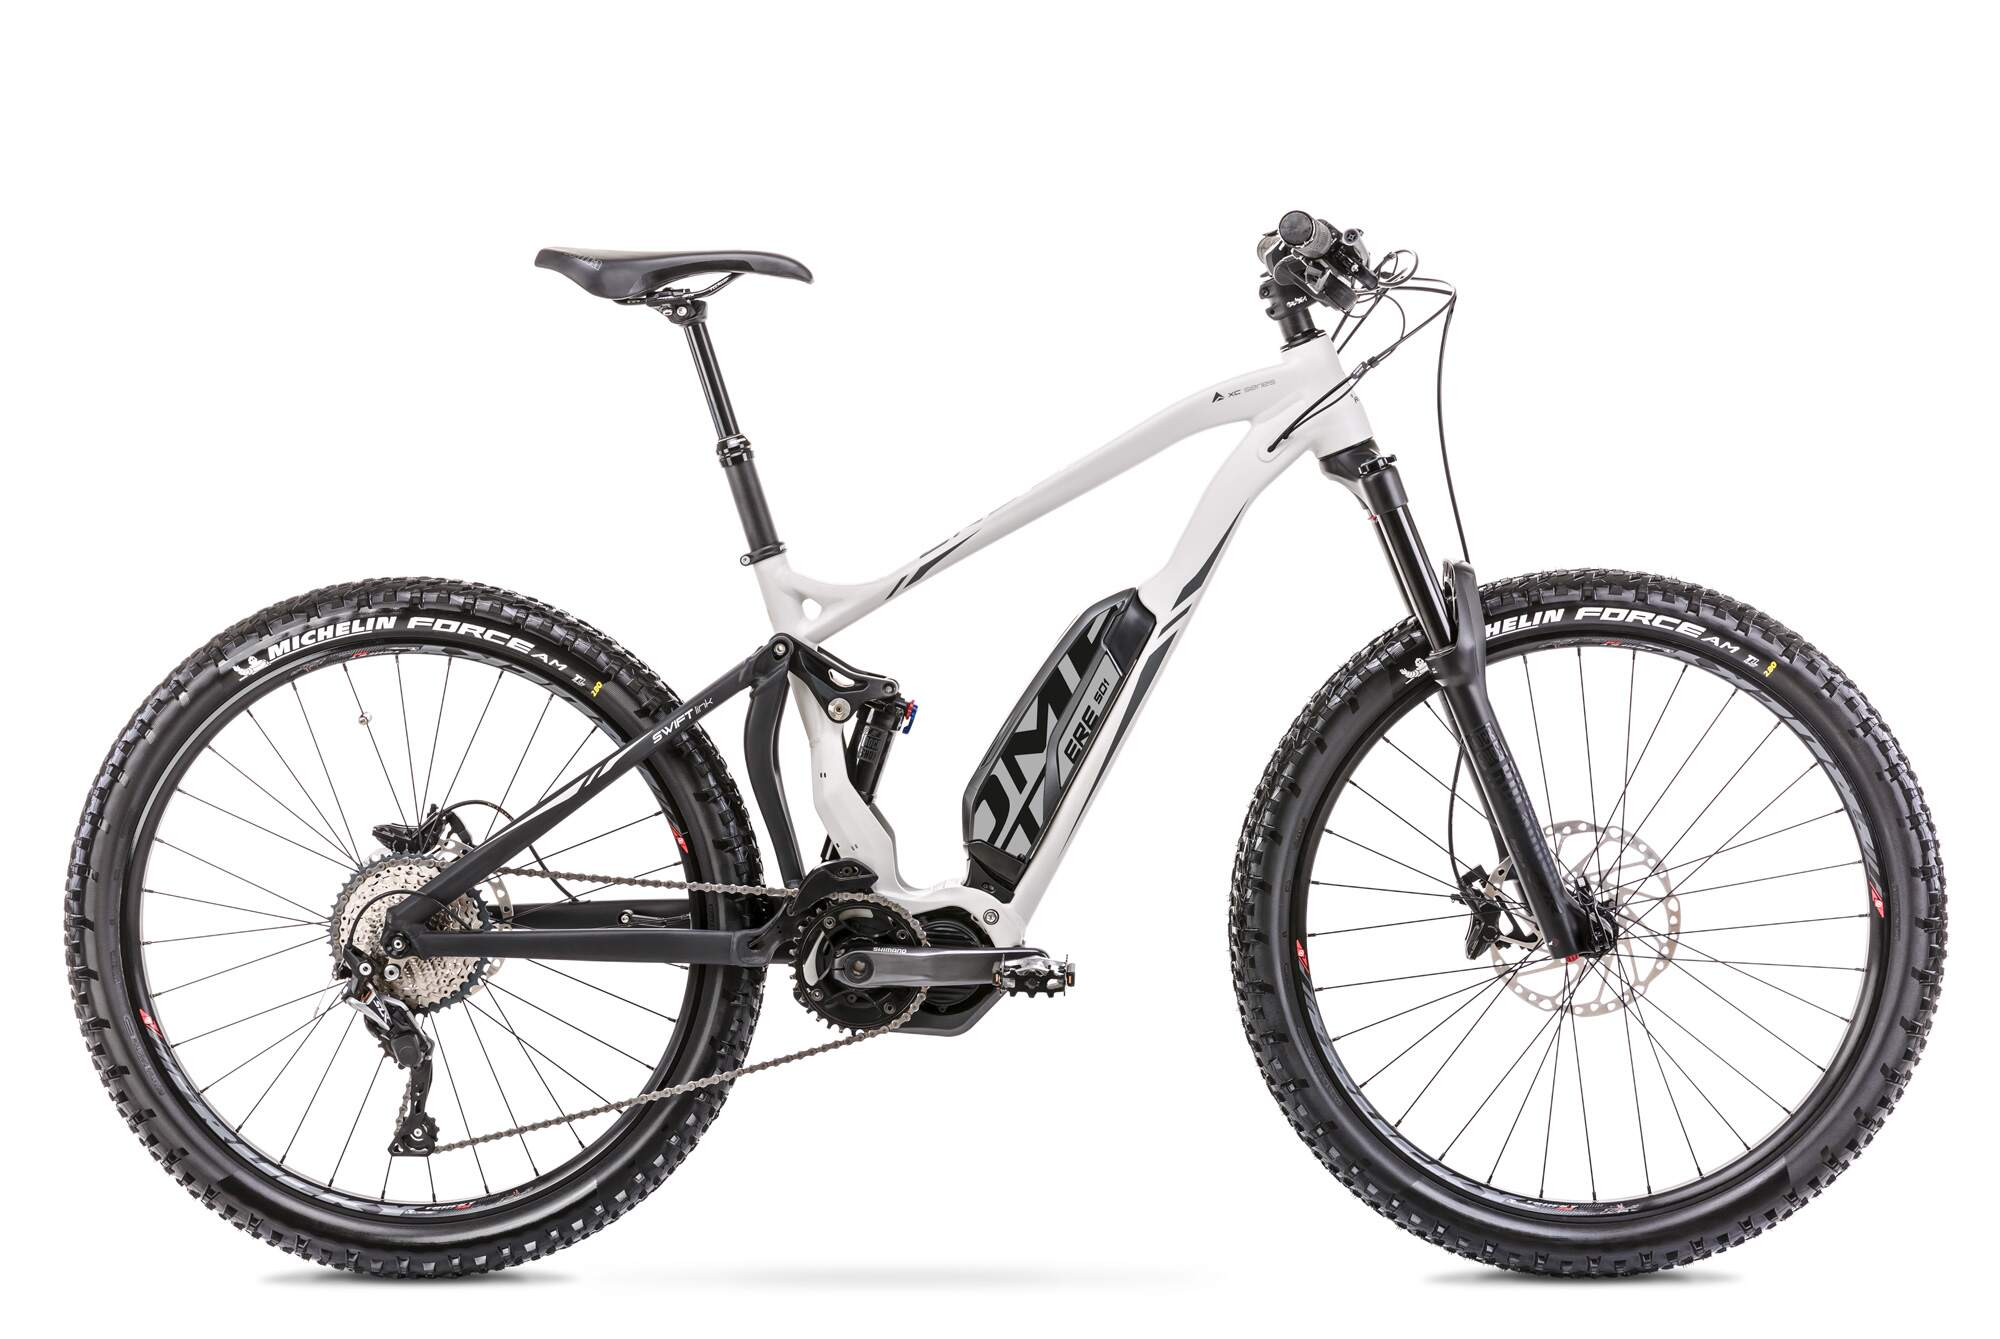 "E Mountainbike Fully Mittelmotor 27,5 Zoll Romet ERE 501 16,5"" Weiss"